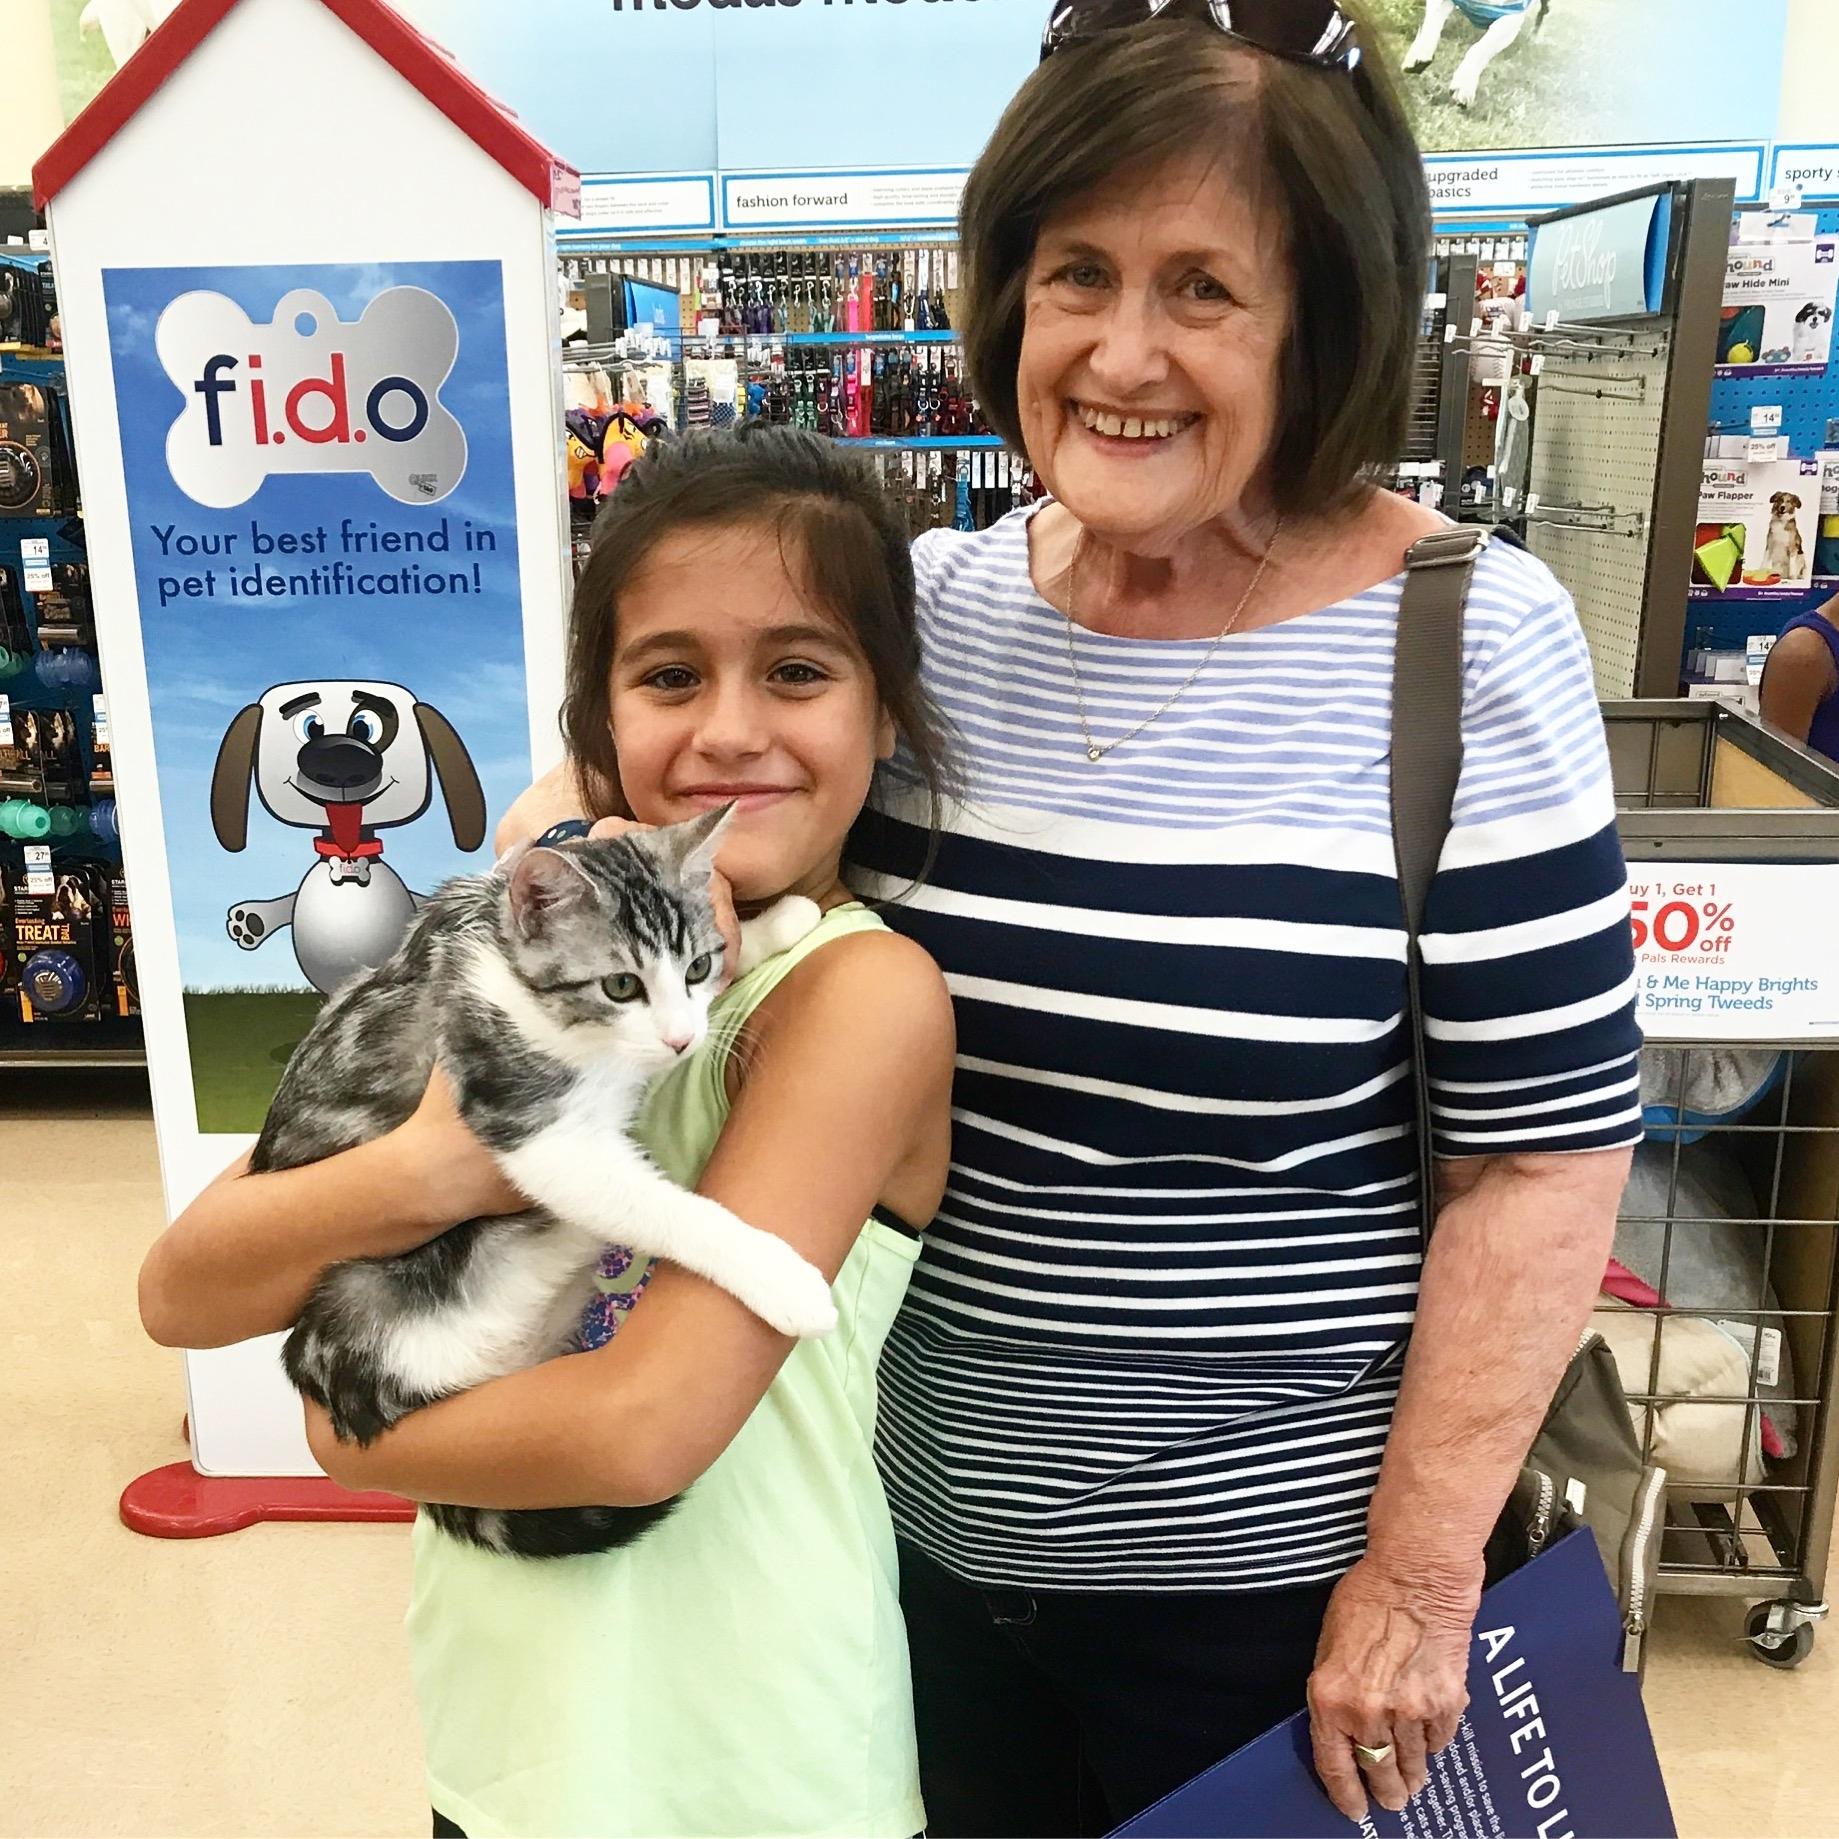 ELLIOT - Adopted September 2017